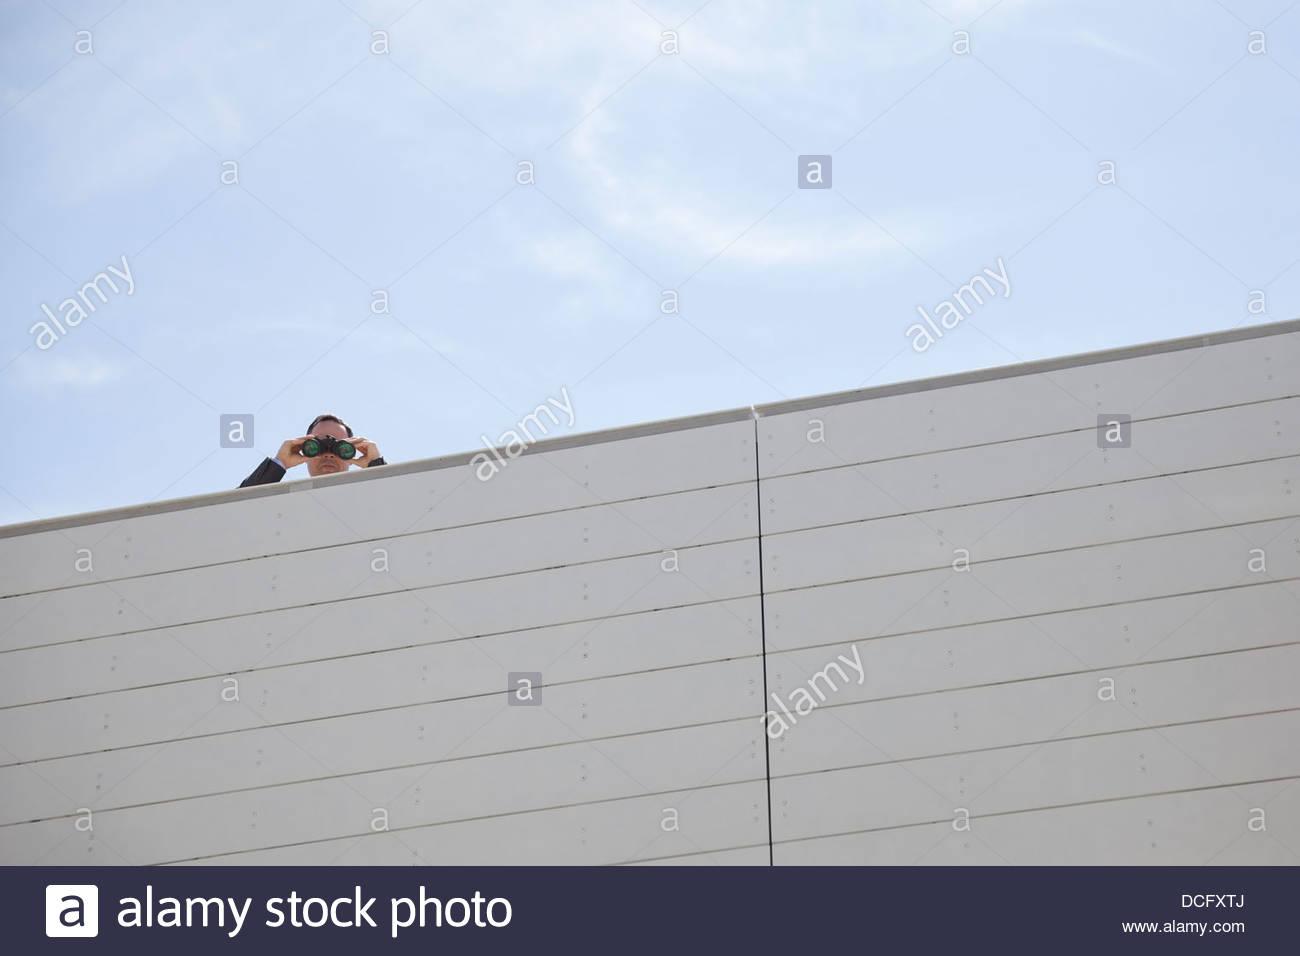 Businessman looking down through binoculars on rooftop - Stock Image